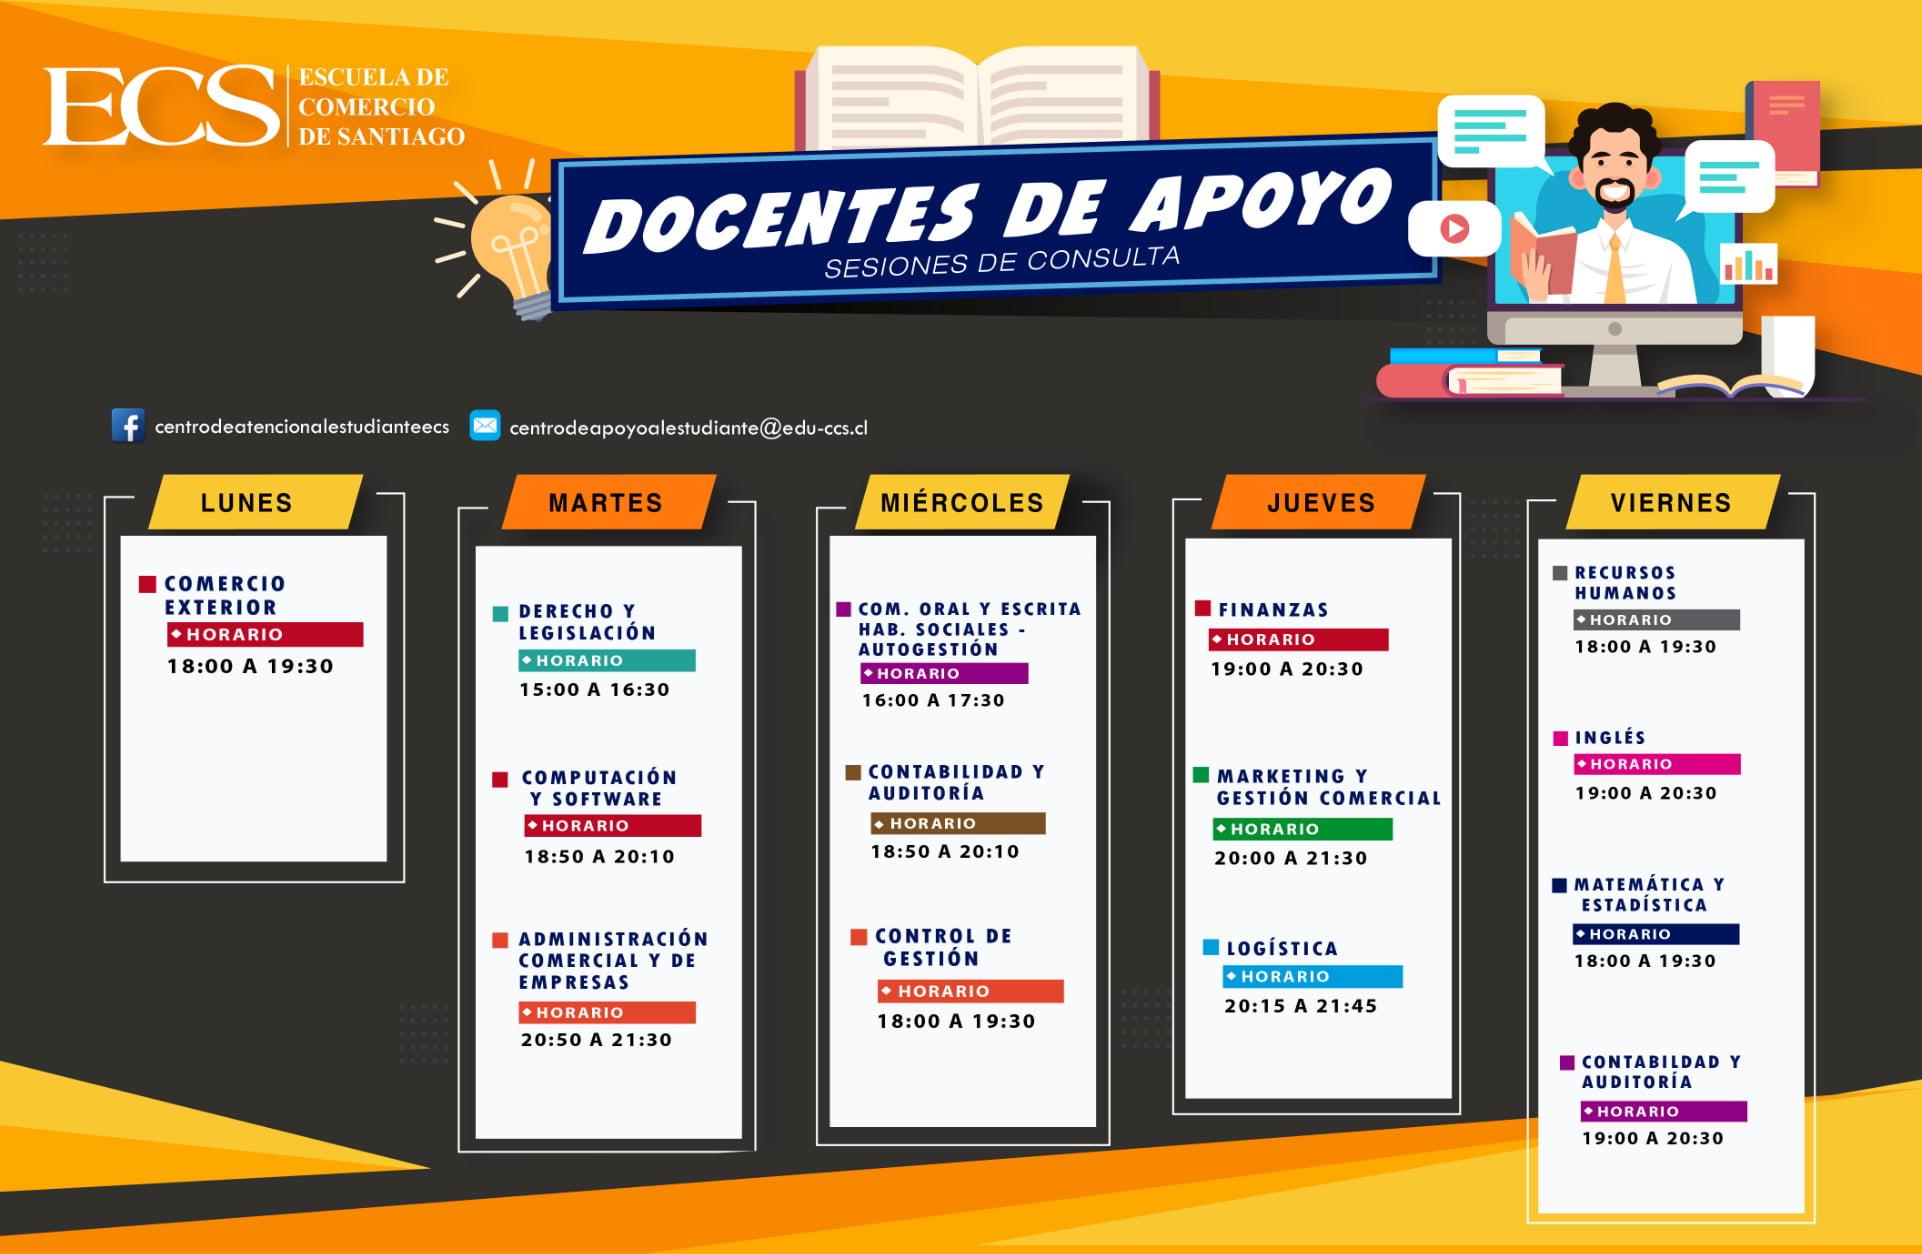 Escuela de Comercio - DOCENTES DE APOYO A LA LÍNEA CURRICULAR ECS